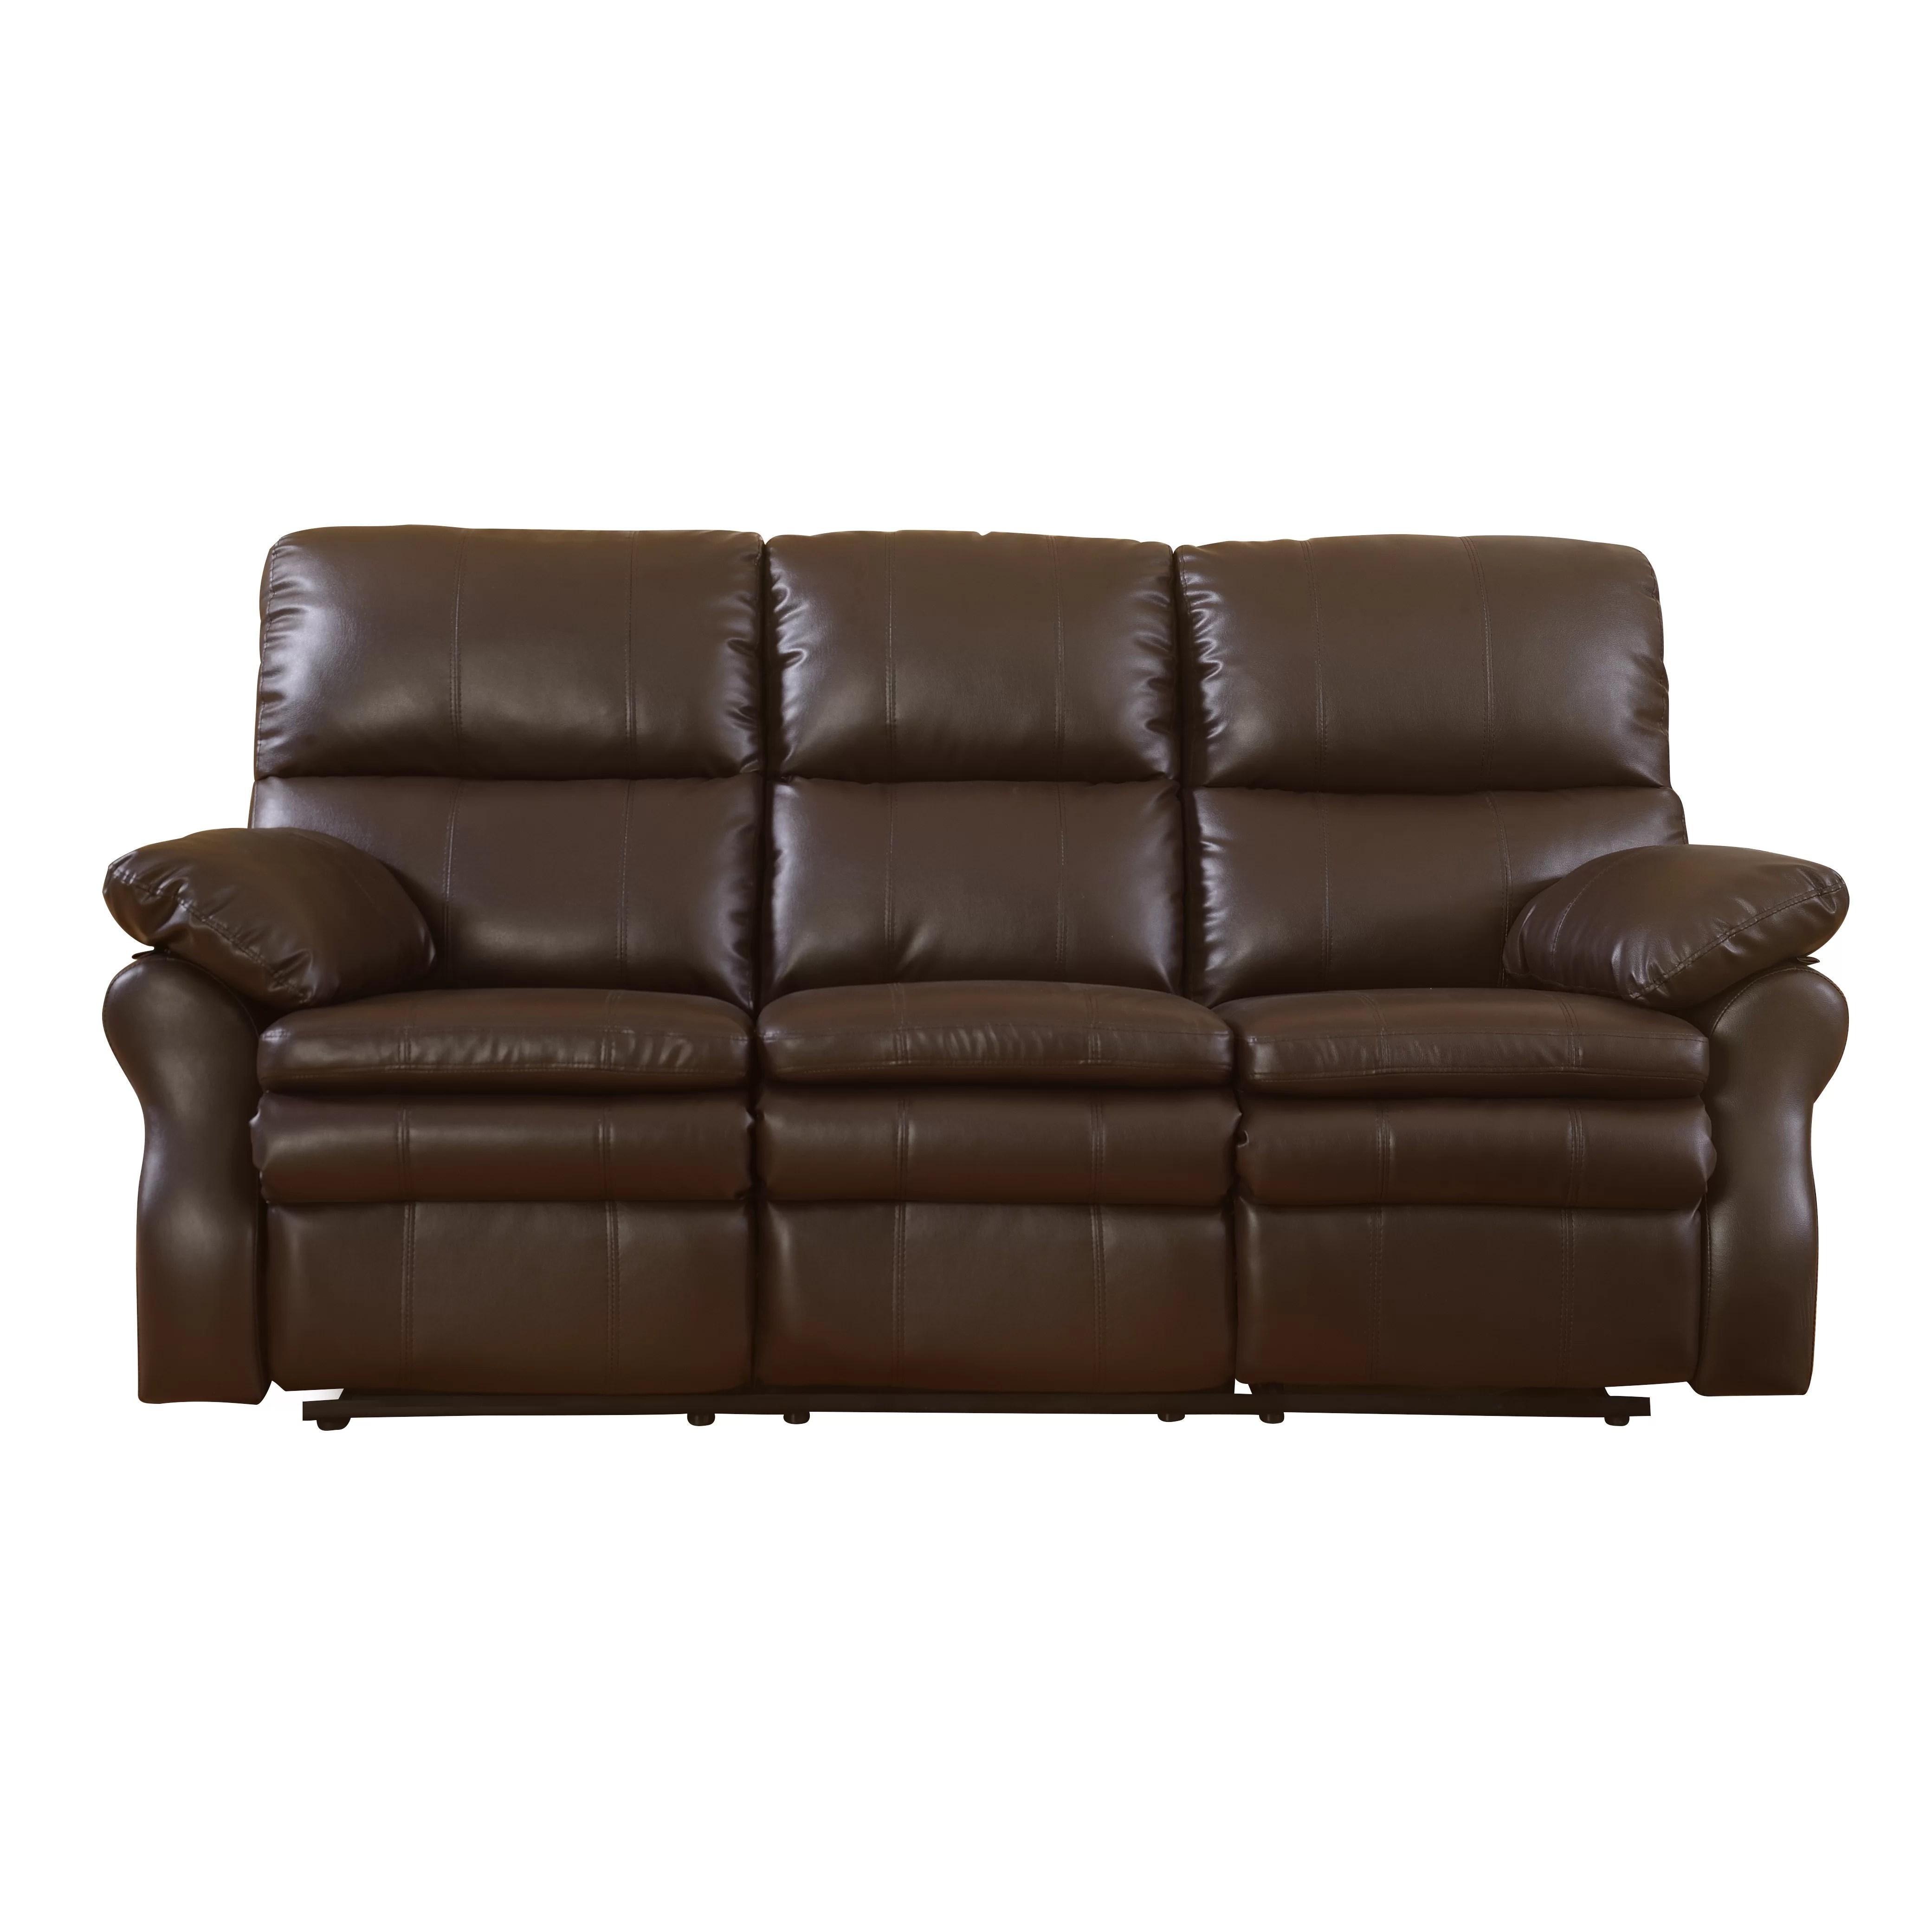 sofa classic heavy duty bed uk madison home usa reclining wayfair